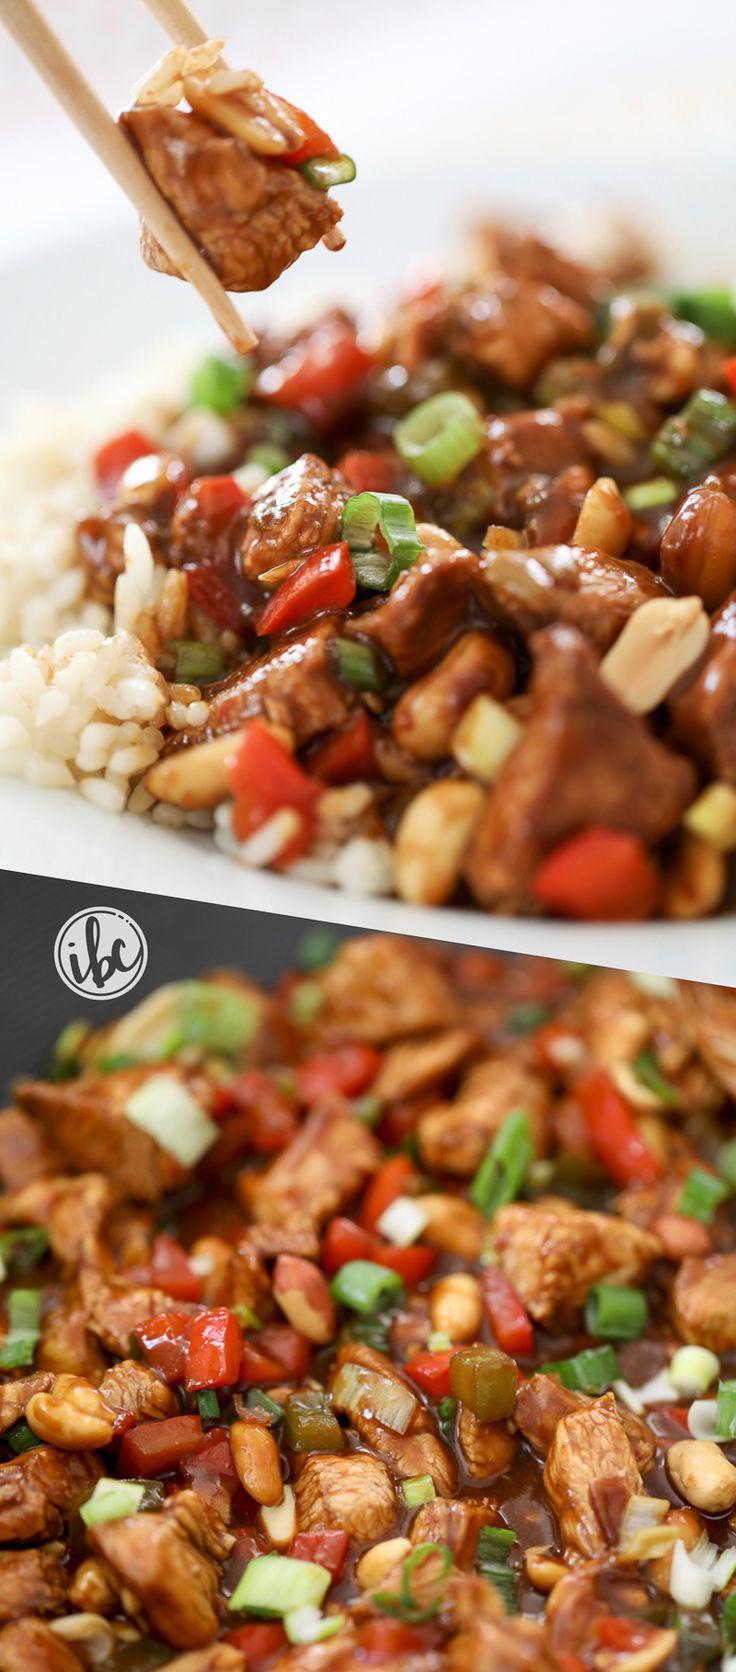 Kung Pao Chicken recipe - homemade easy kung pan chicken dinner recipe